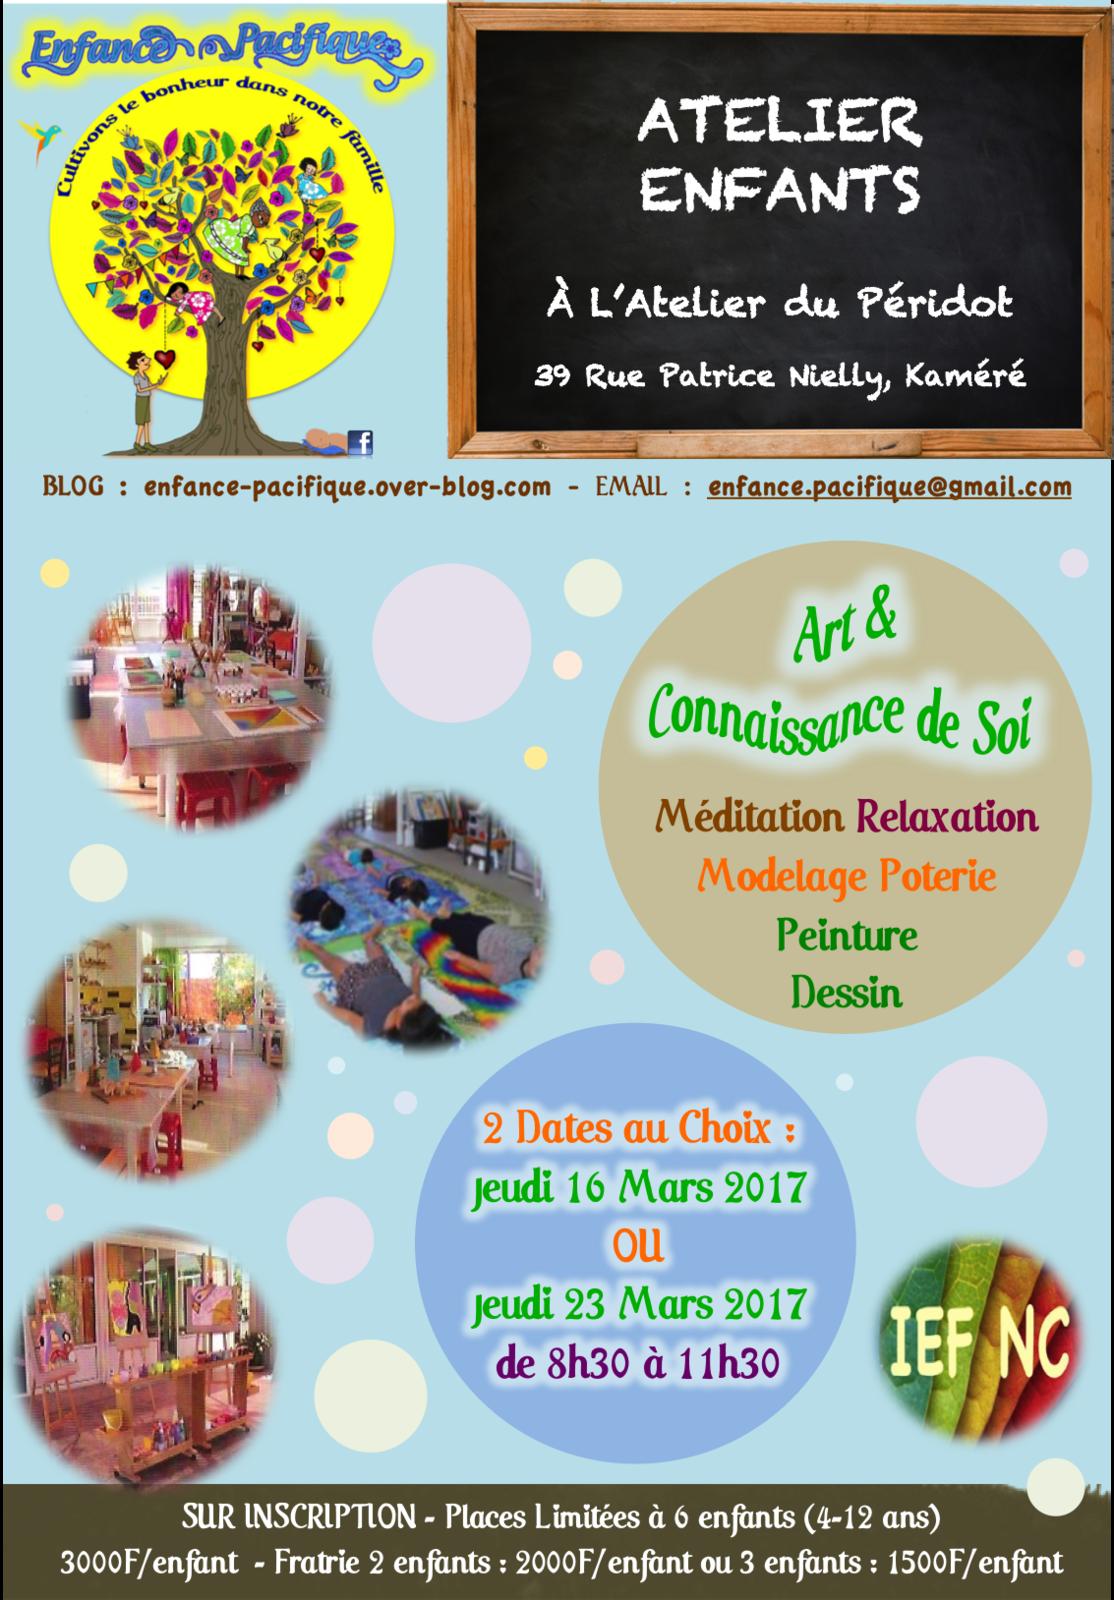 Groupe IEF-NC